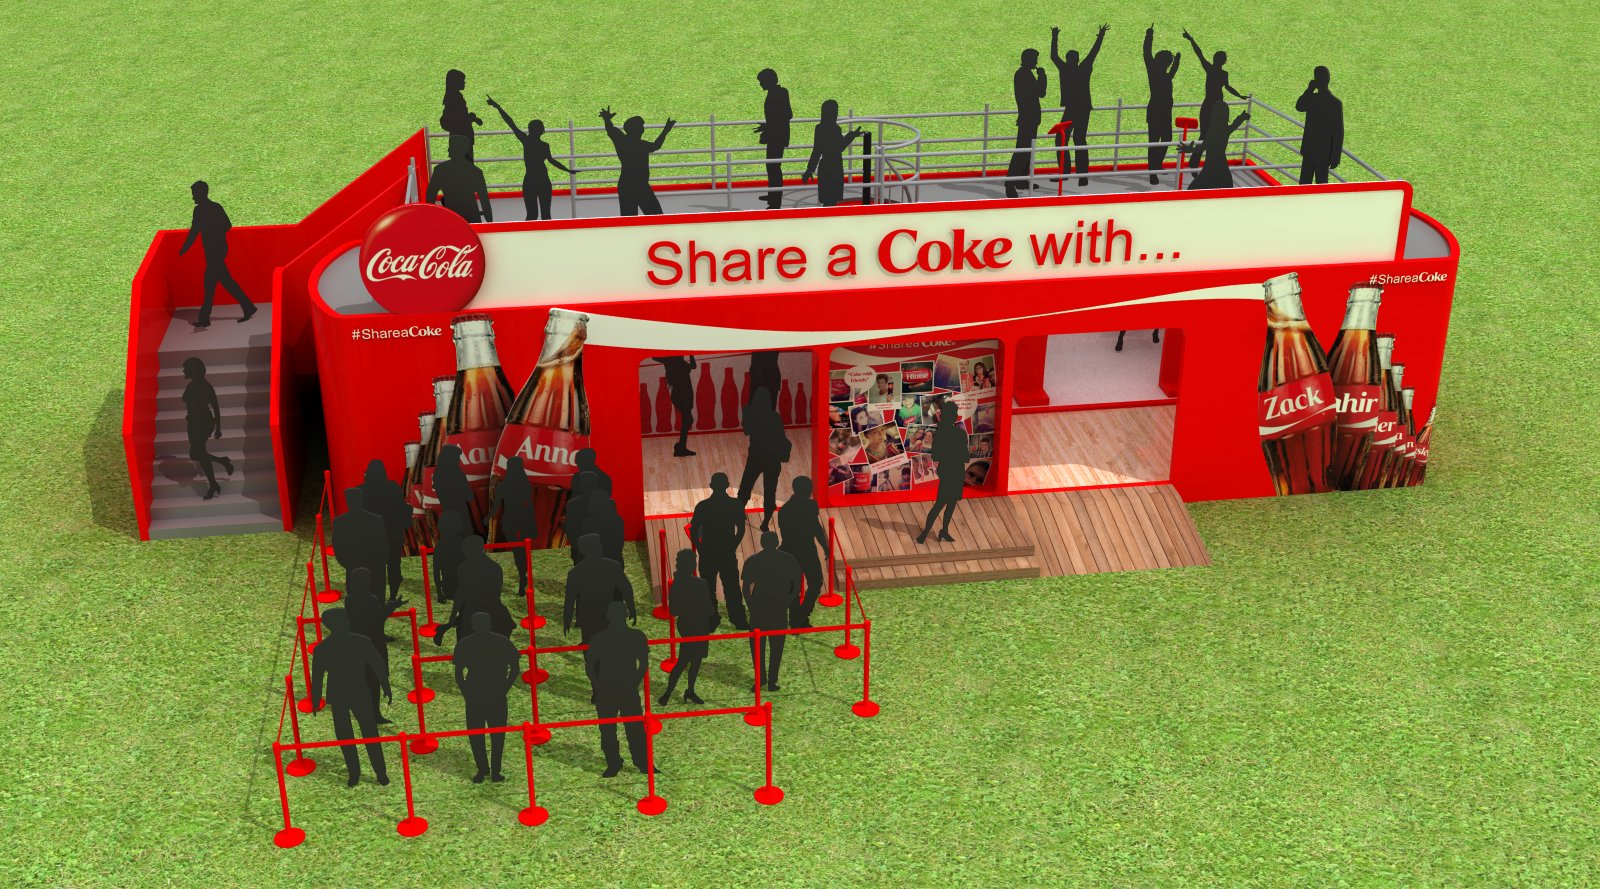 Share A Coke Render England UK HEART design